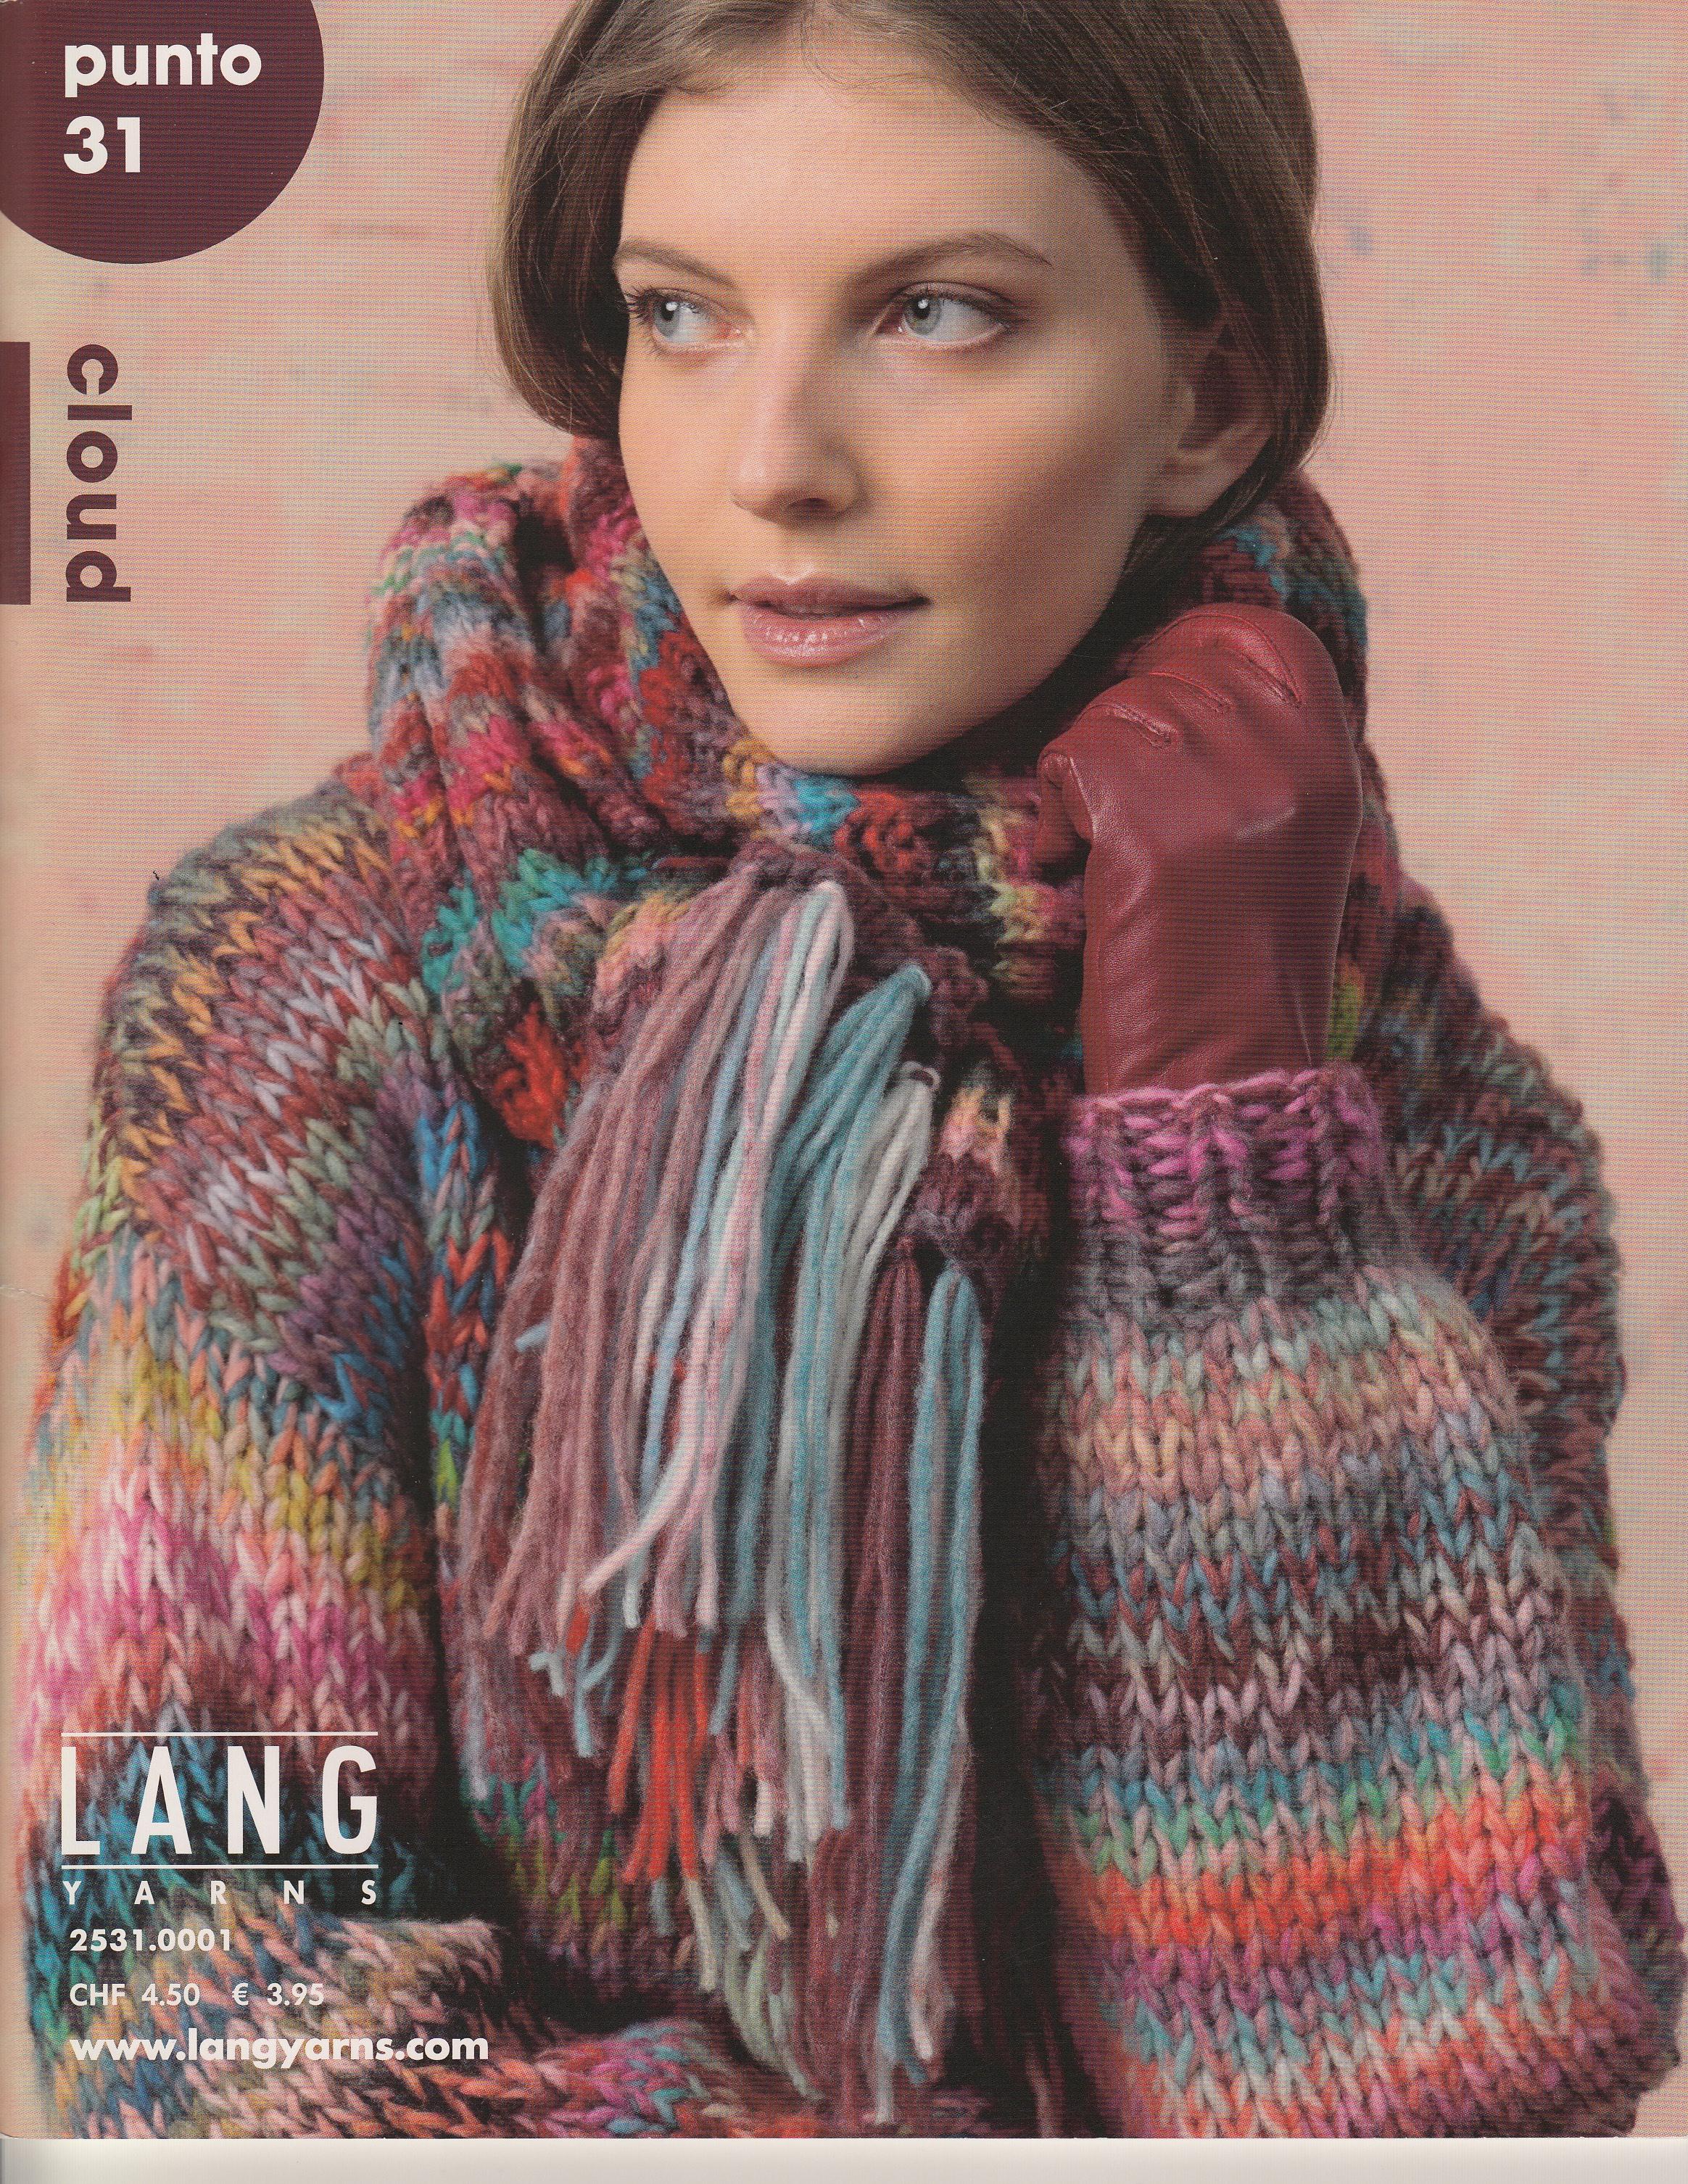 LANGYARNS Magazin Punto No 31 Cloud